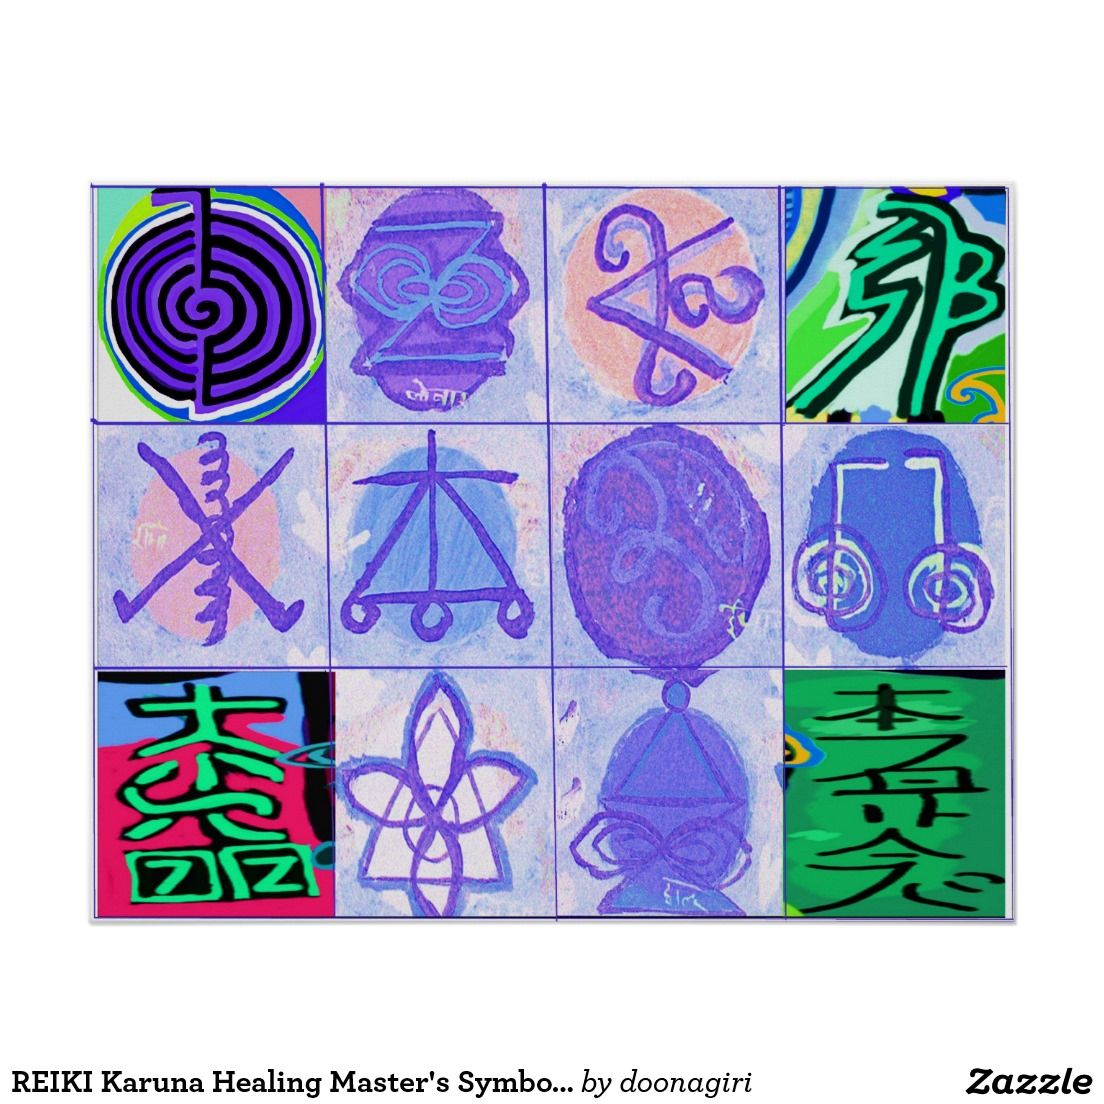 Reiki karuna healing masters symbols poster 101 zazzle pro reiki karuna healing masters symbols poster biocorpaavc